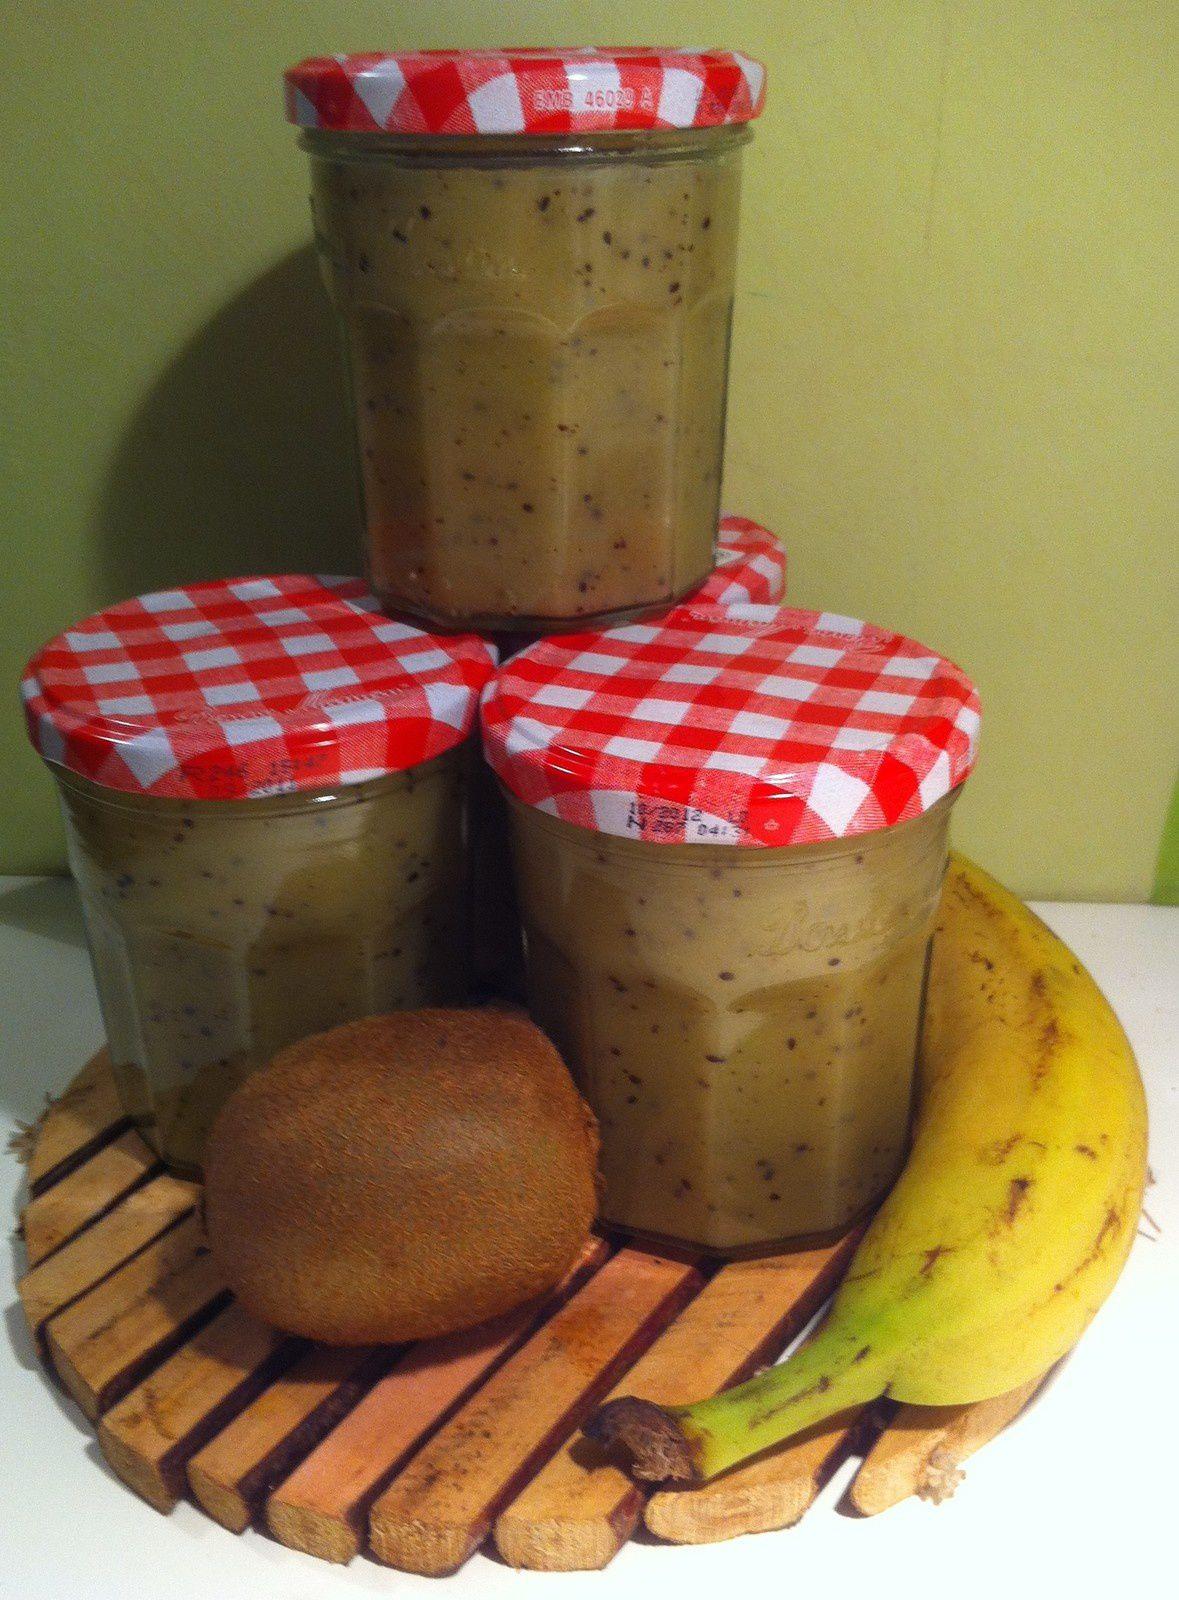 Confiture banane-Kiwi / Bananen-Kiwis-Marmelade